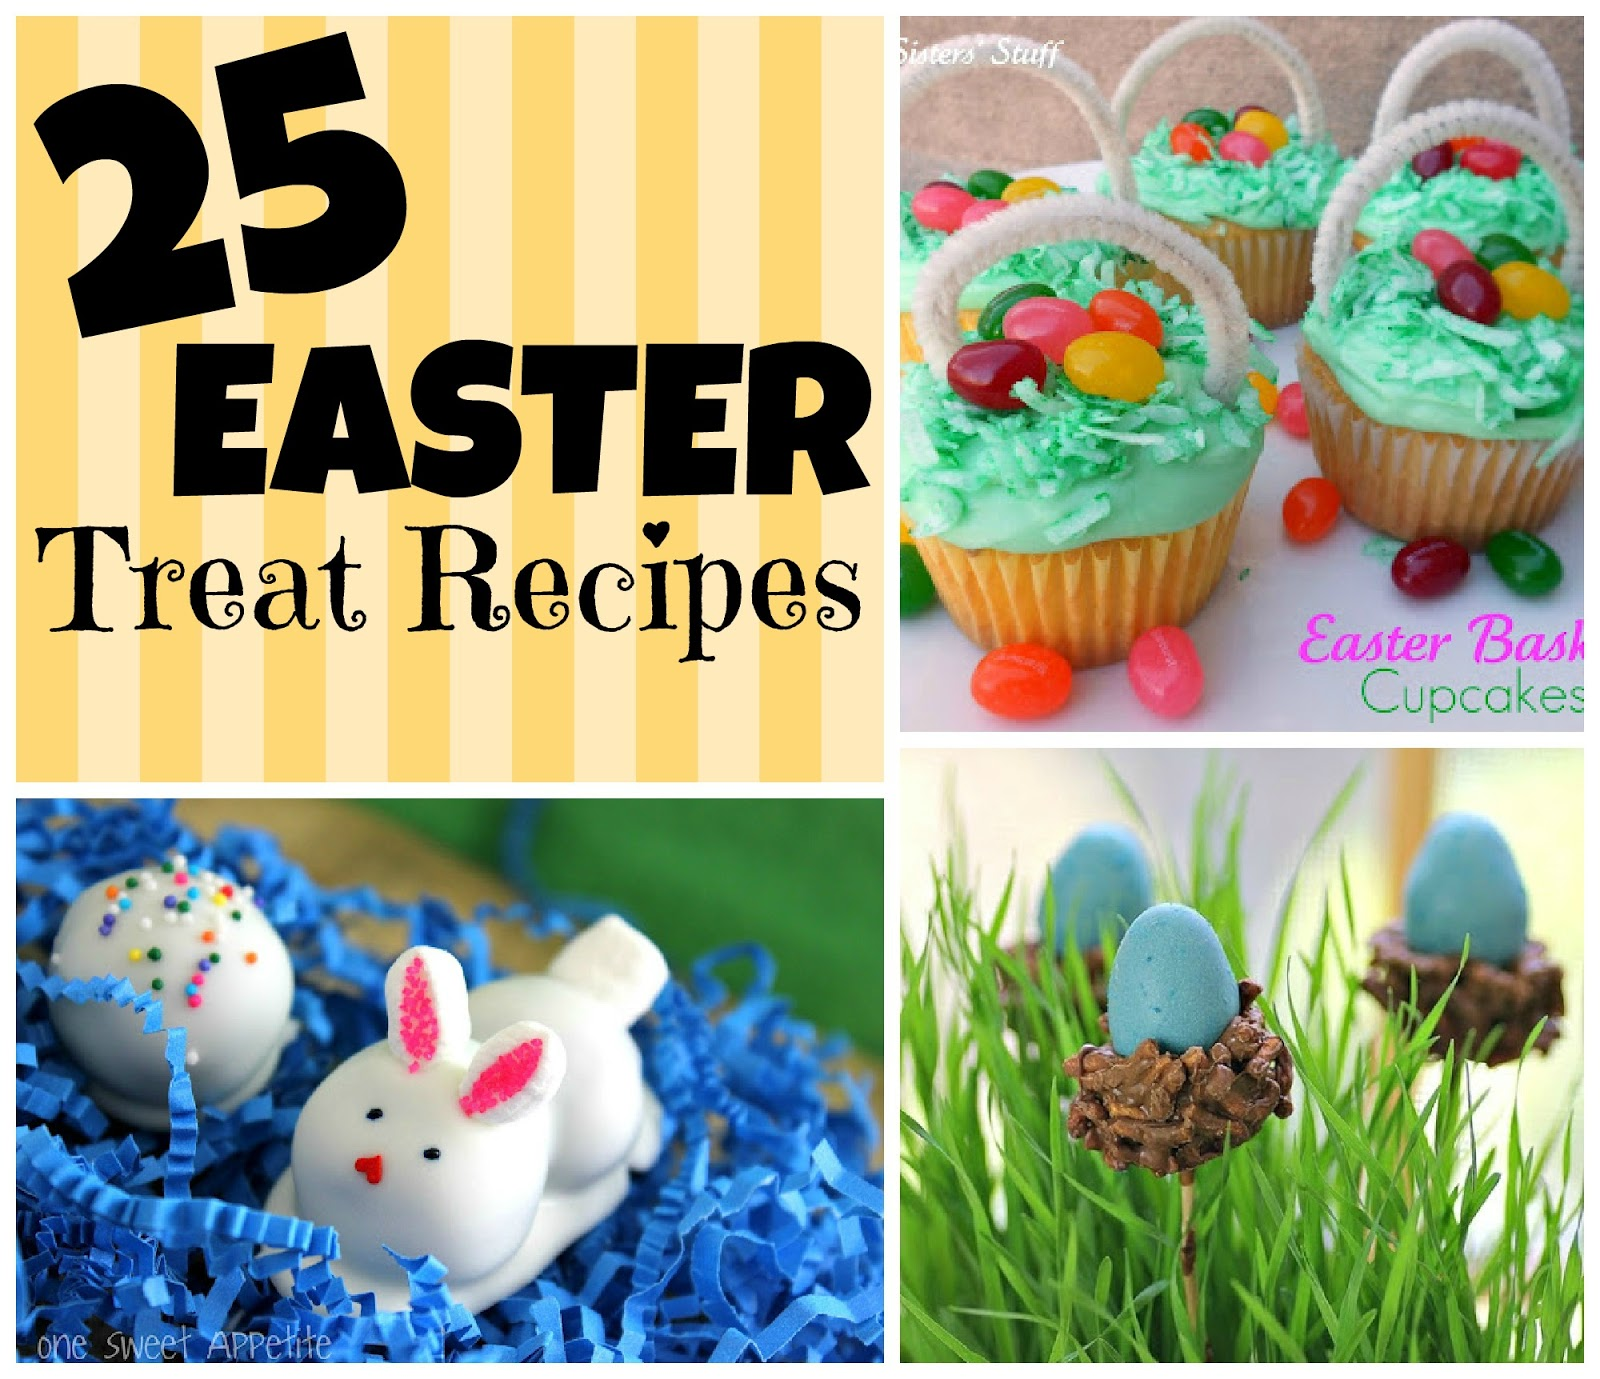 25 Easter Treat Recipes